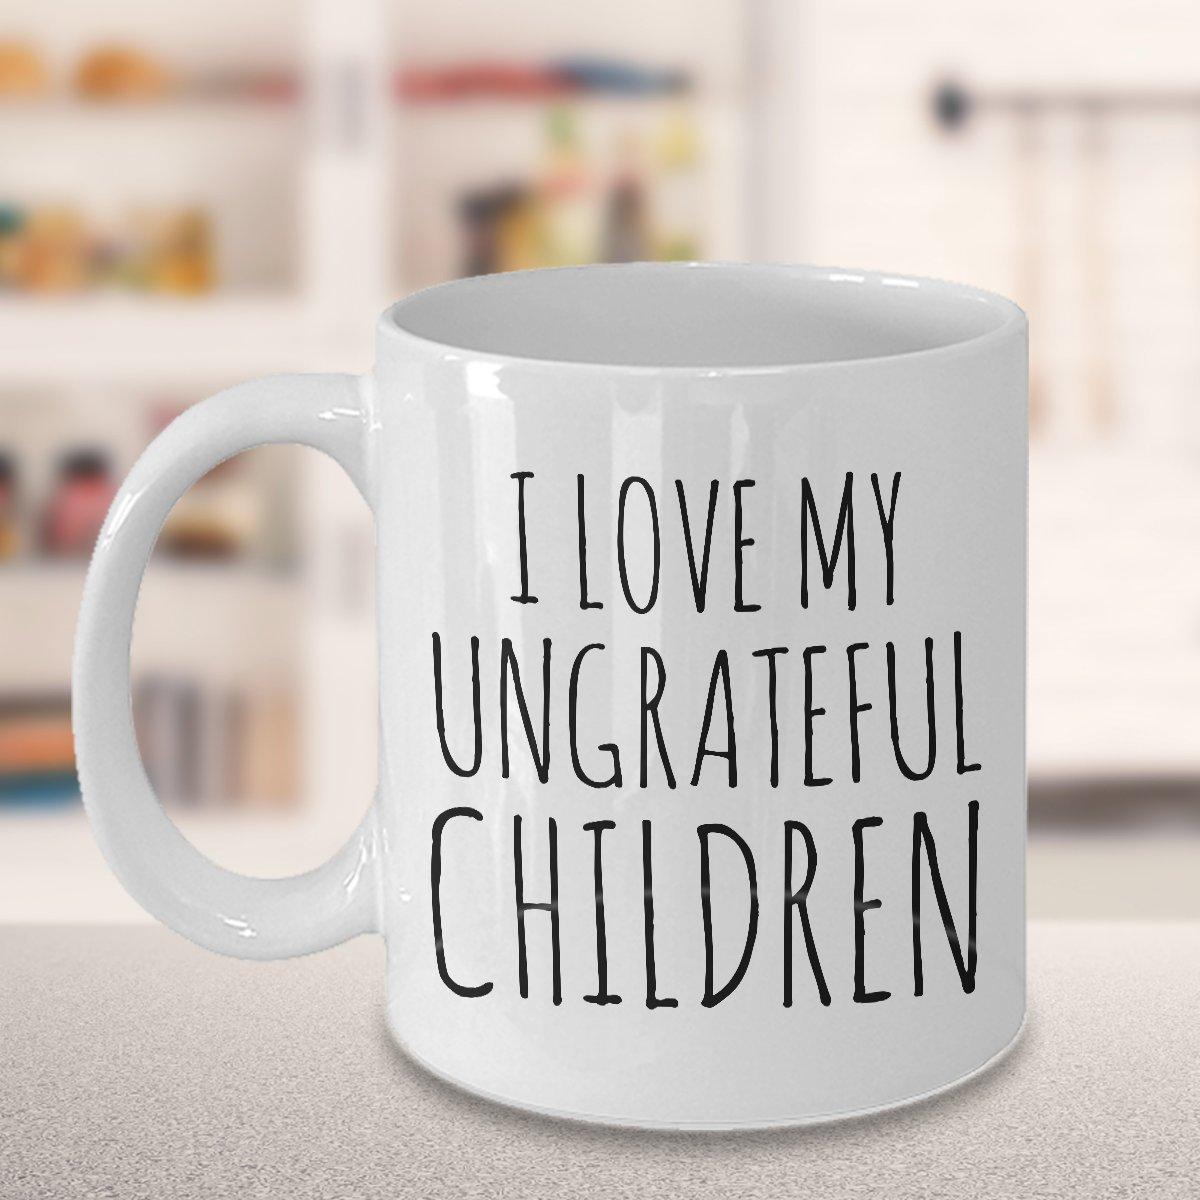 I Love My Ungrateful Children Mug Funny Ceramic Coffee Cup Gifts